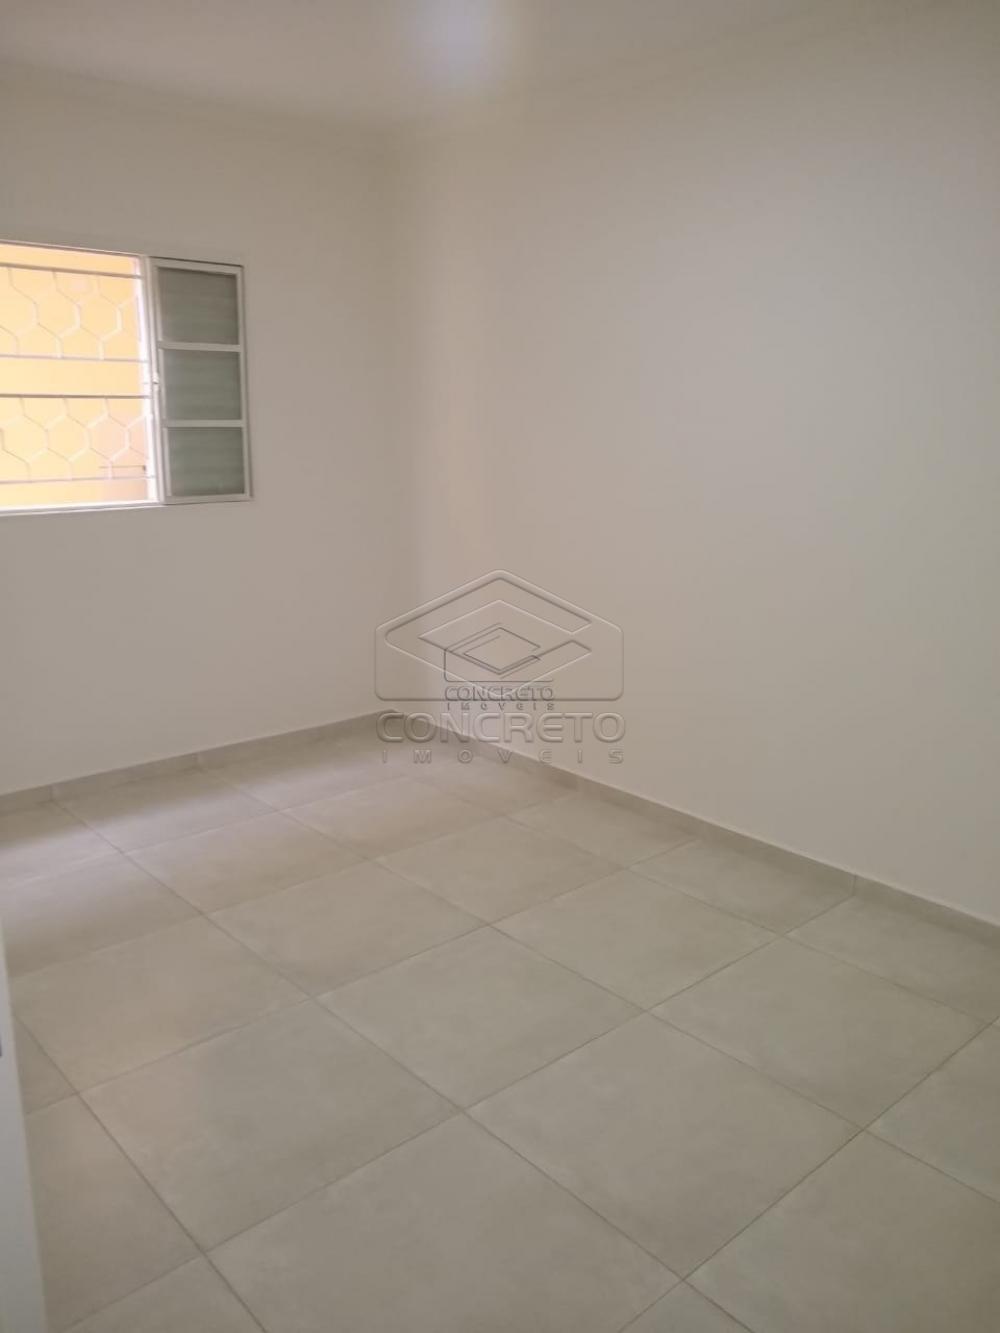 Comprar Casa / Condomínio em Bauru R$ 280.000,00 - Foto 27